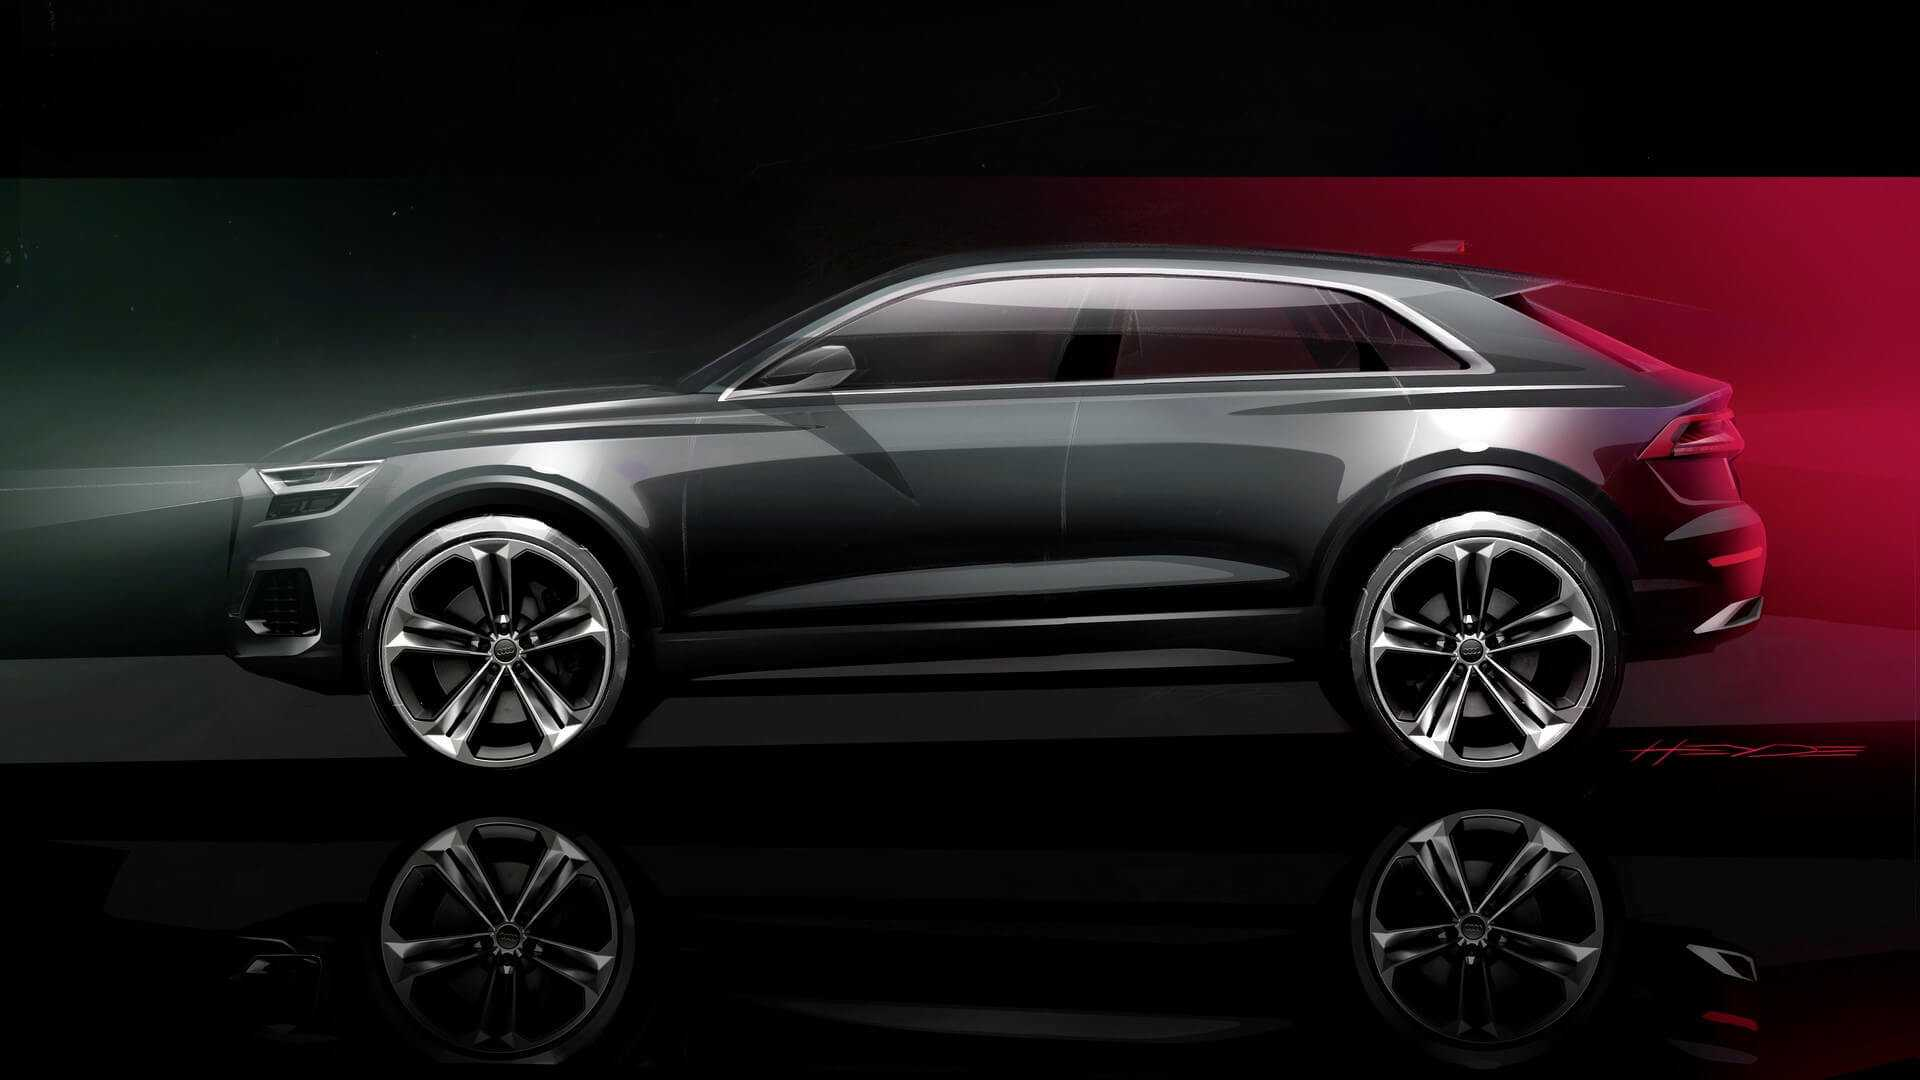 2020 Audi Q9 Redesign and Concept